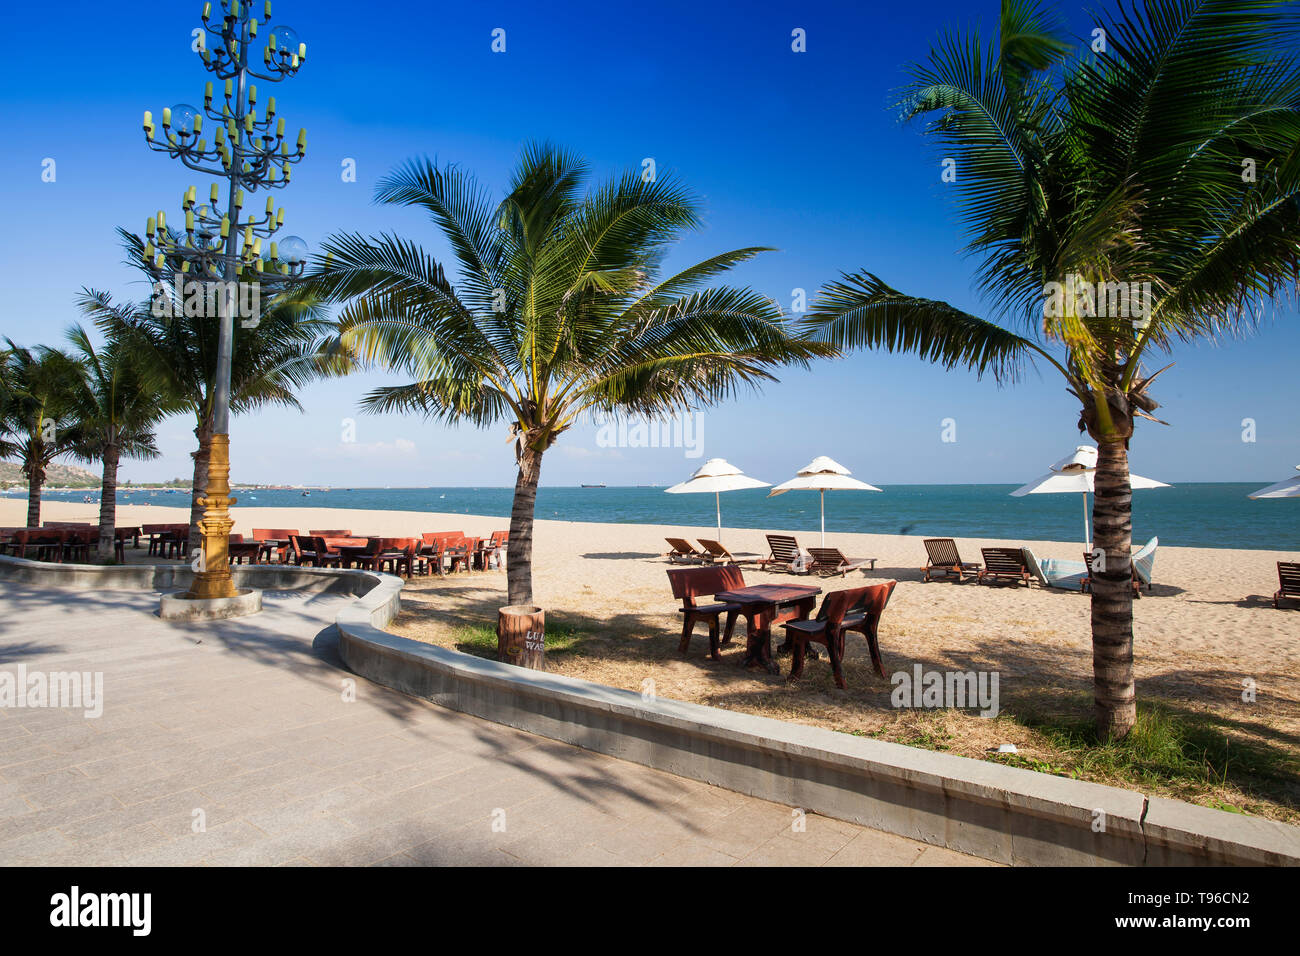 Beach promenade near Saigon Ninh Chu Resort on Phan Rang Beach,south china sea, Ninh Thuan, Vietnam - Stock Image